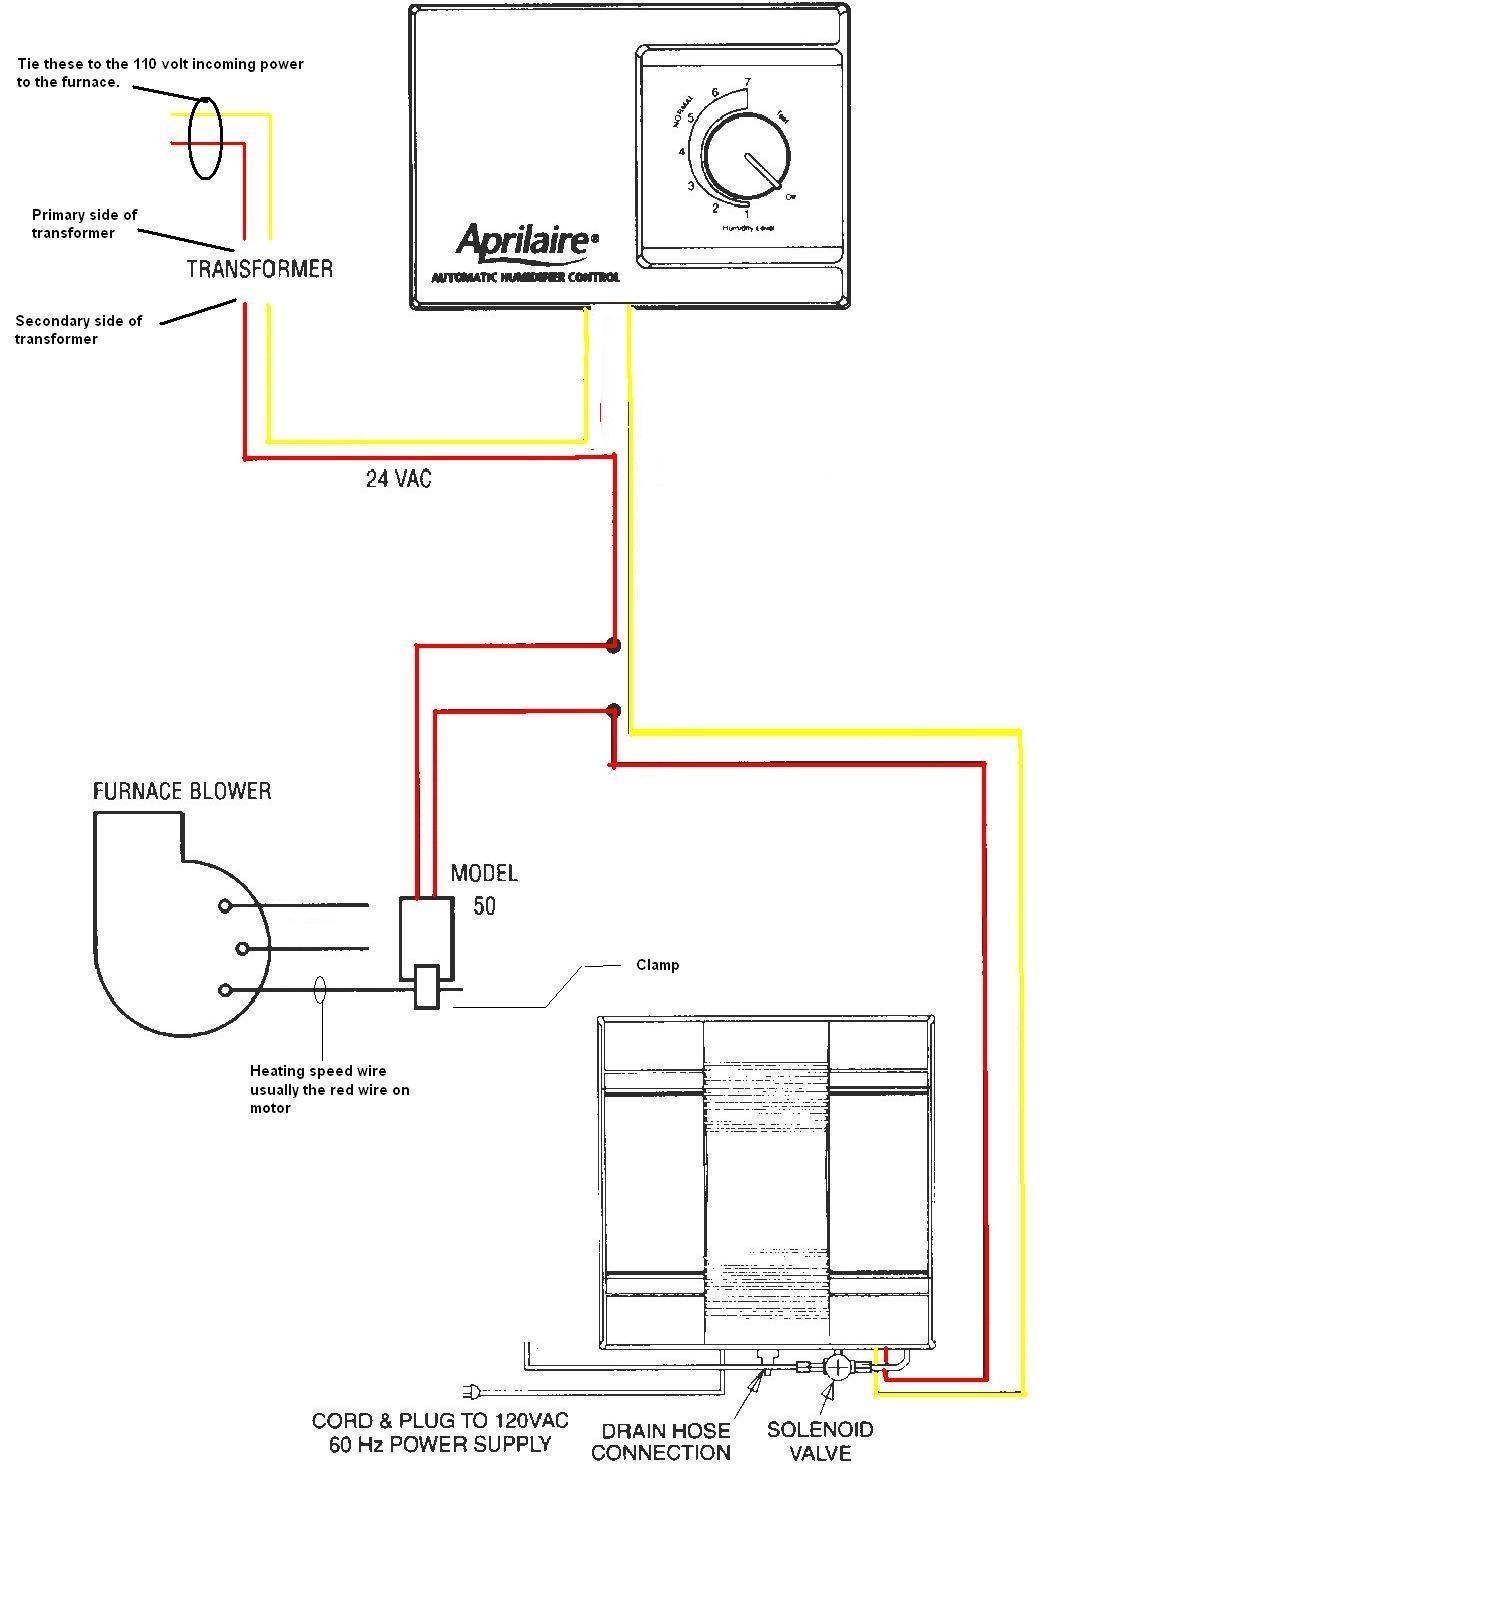 Car Wiring Diagram Liry Schematics Auto Ford Honeywell Lyric T5 Unique Image Simple Diagrams